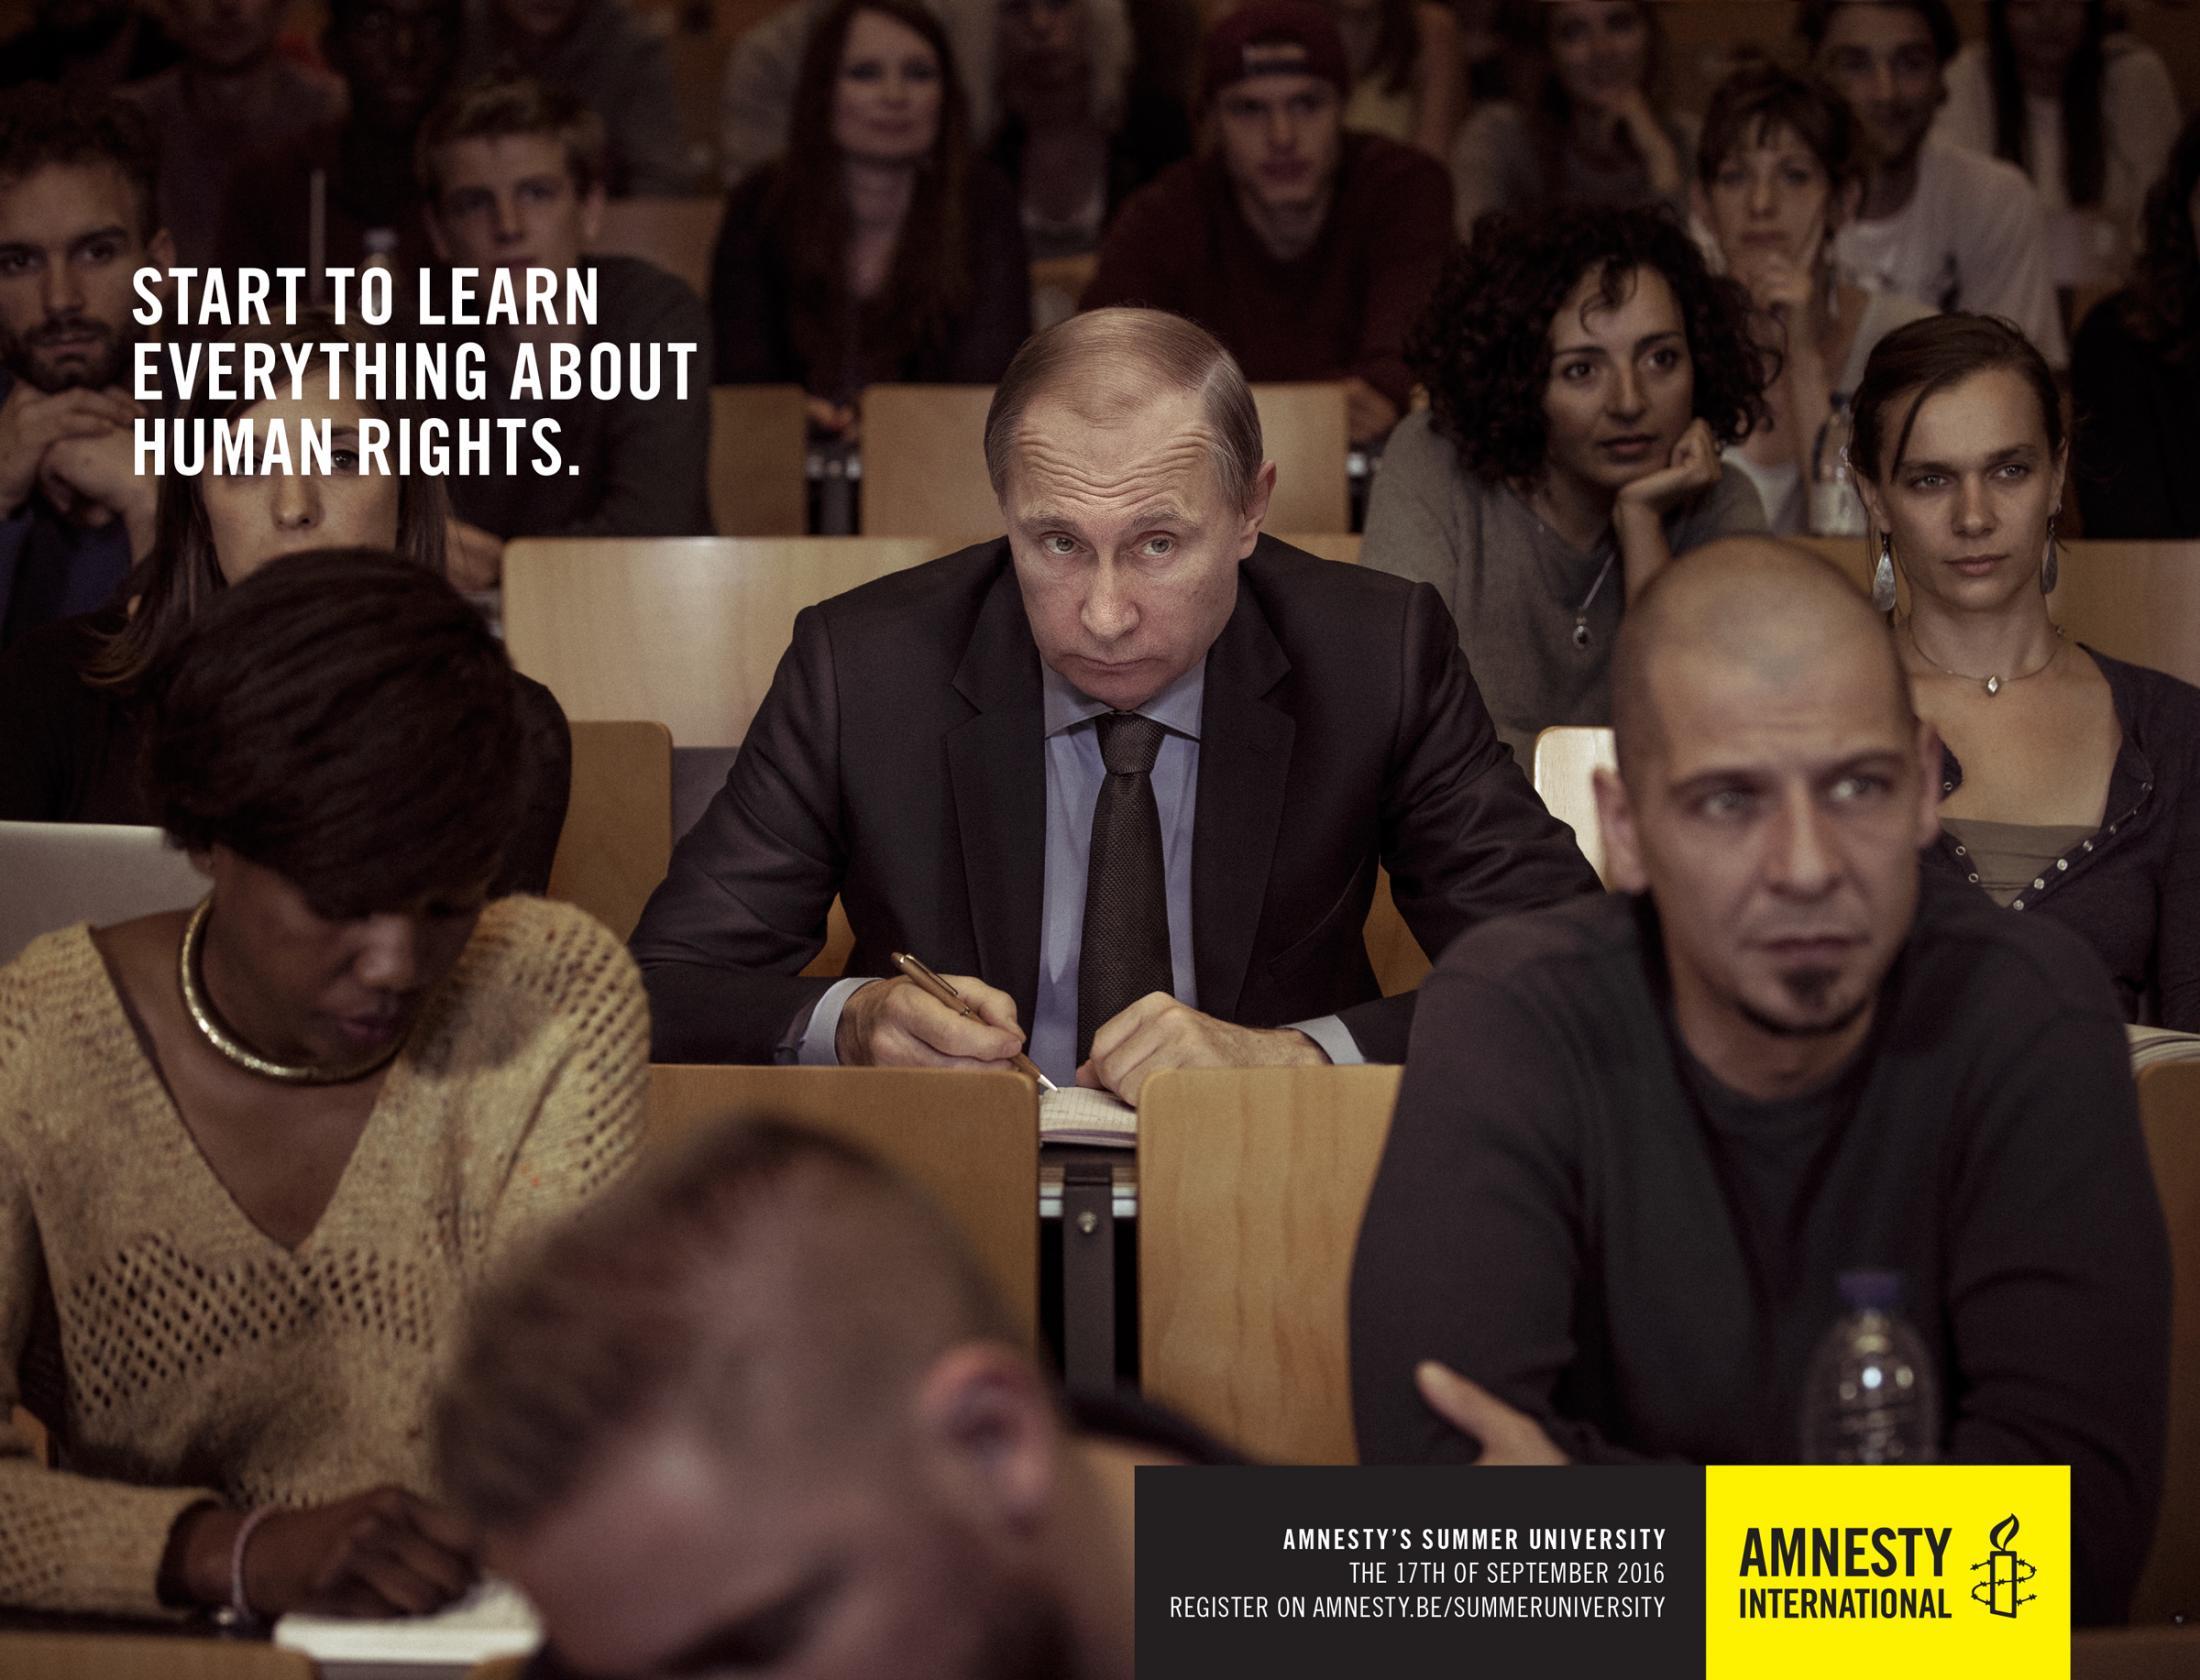 Amnesty International Outdoor Ad - Putin